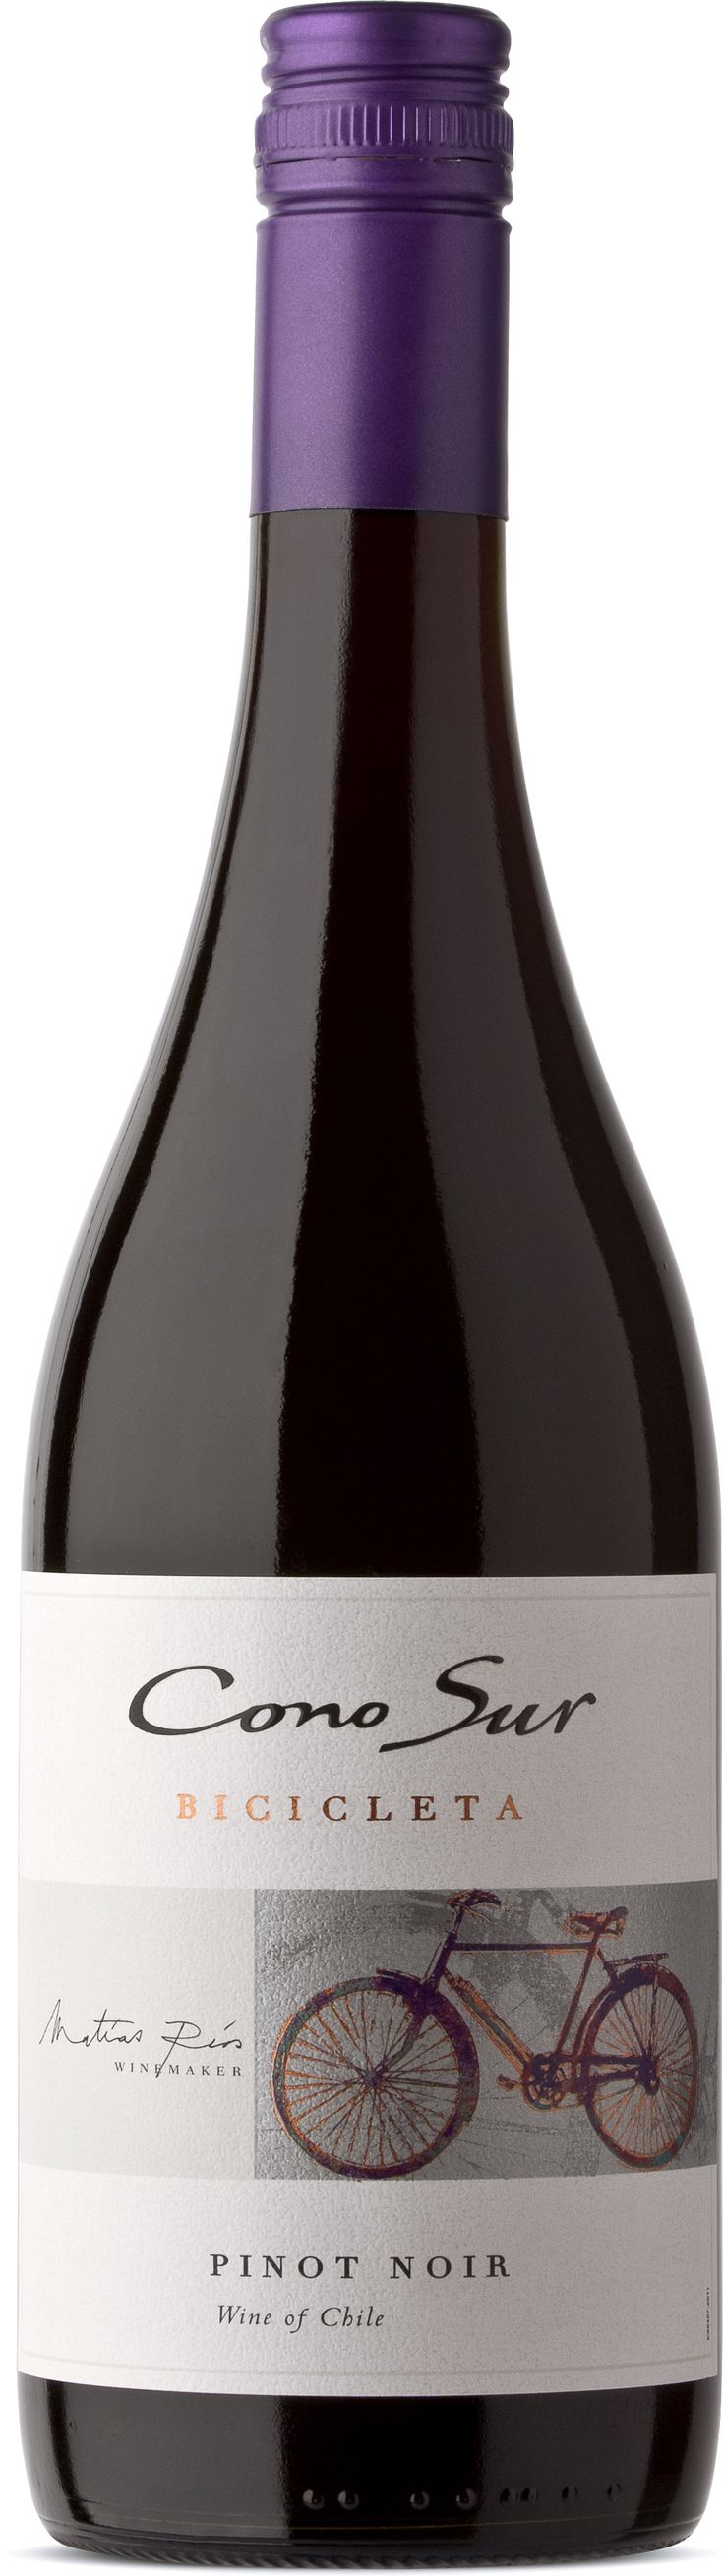 Wine Spectator Wine of the Day  Cono Sur Bicicleta Pinot Noir 2011  wine / vinho / vino mxm